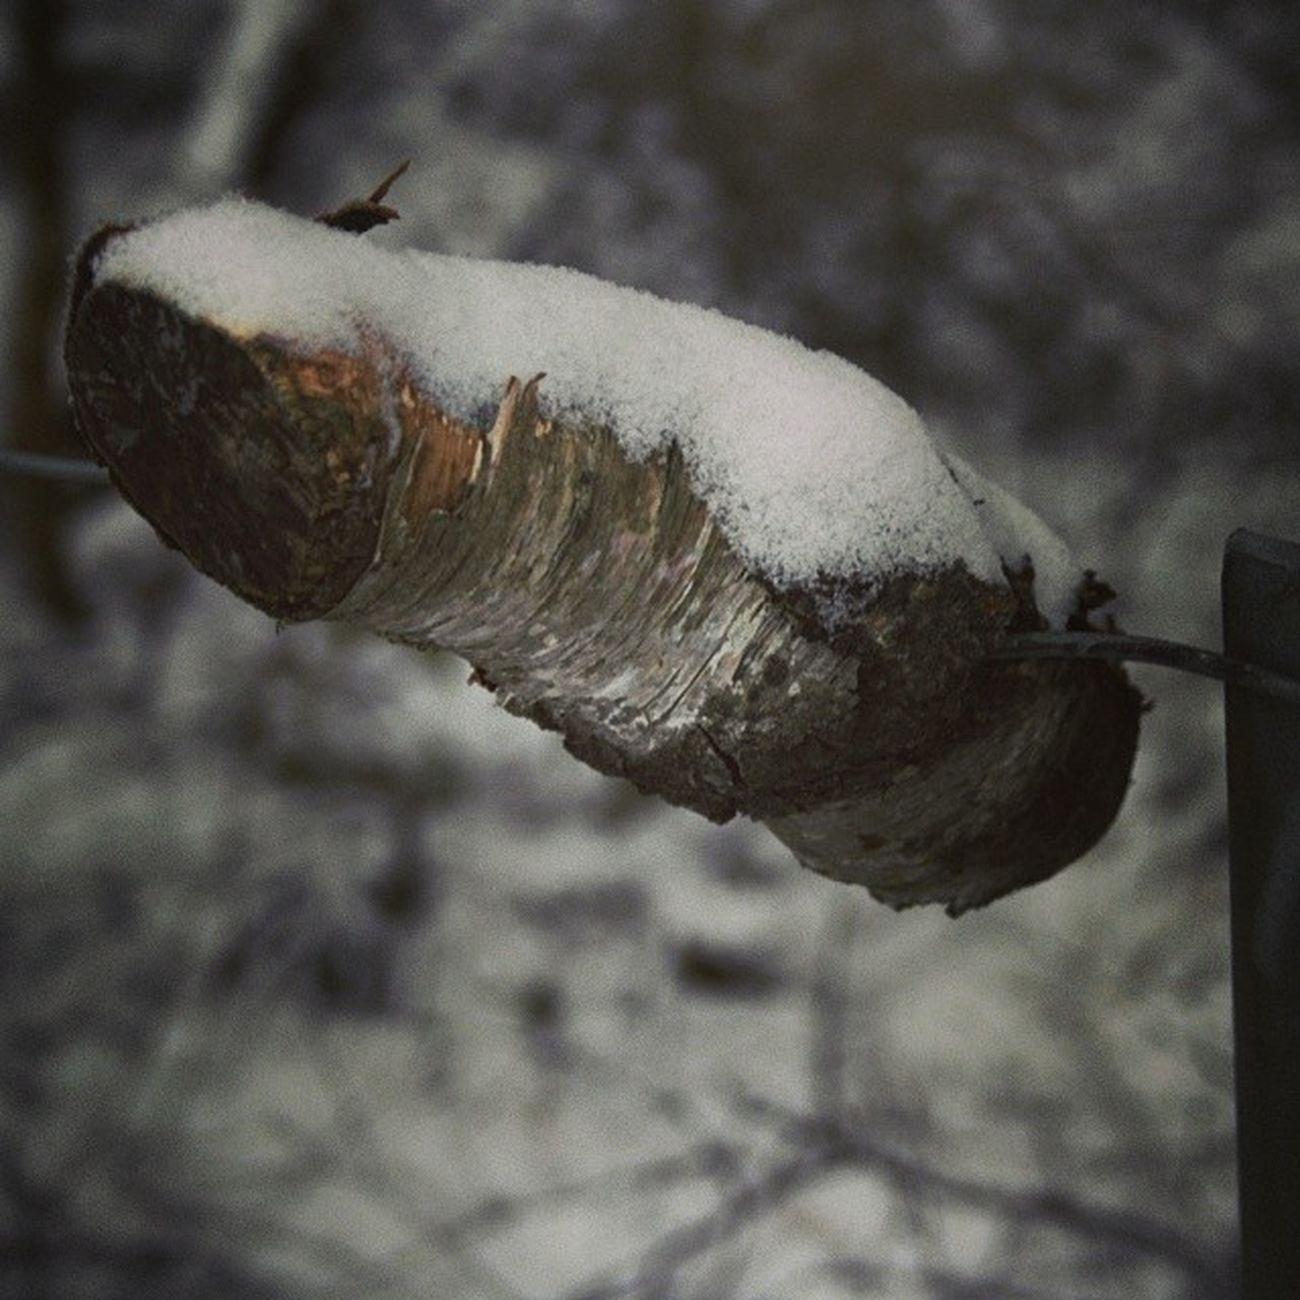 Ilovenorway Ilovenorway_akershus Follo  ås worldunion wu_norway winter frost snow ig_world ig_norway ig_week macro